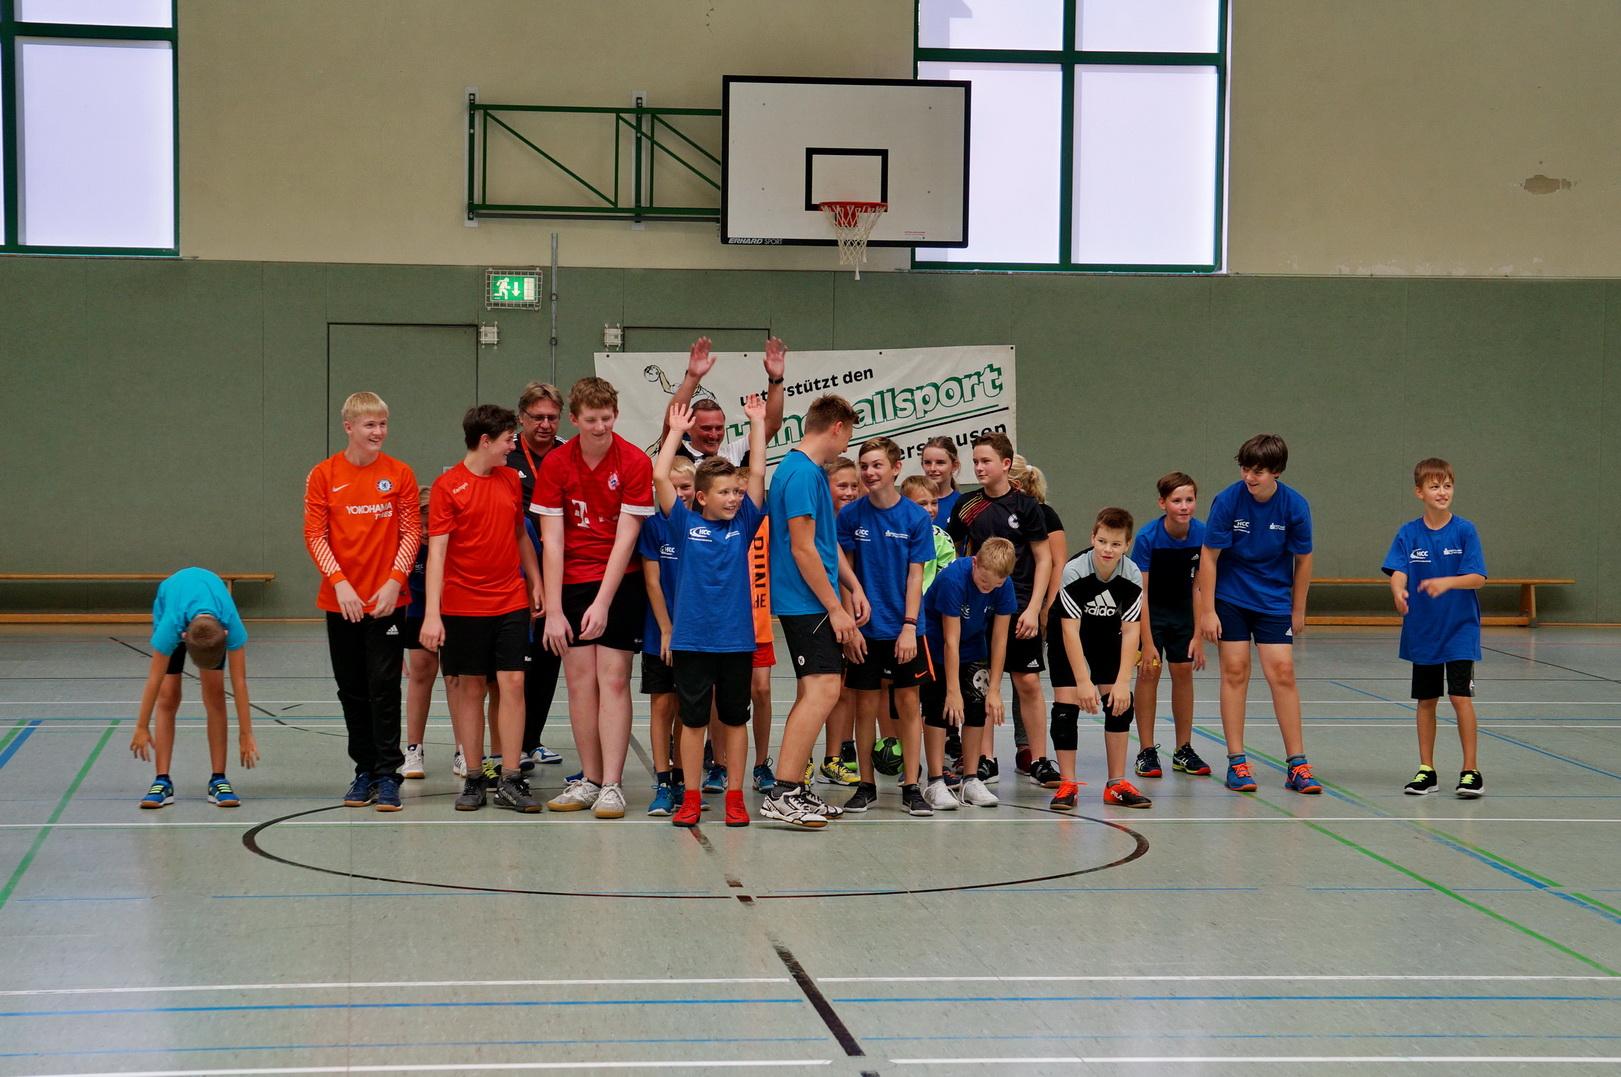 201808_Handballcamp_SDH_MG_298w